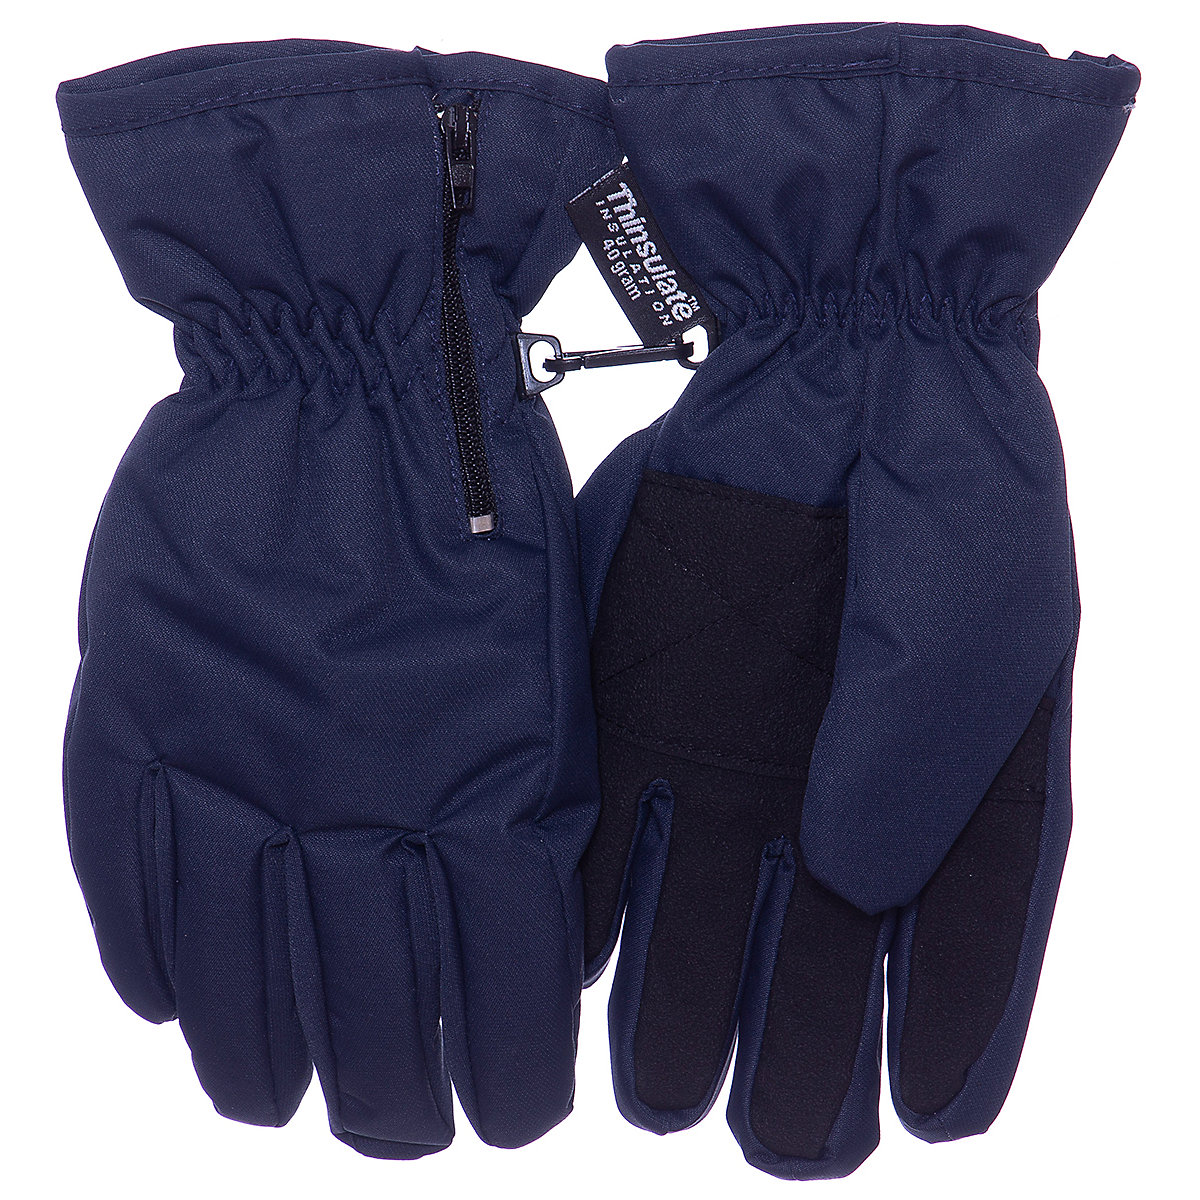 Ticket to Heaven Gloves & Mittens 8882627 glove mitten winter clothes for children girls boys girl boy reima jackets 8665394 for girls polyester winter fur clothes girl